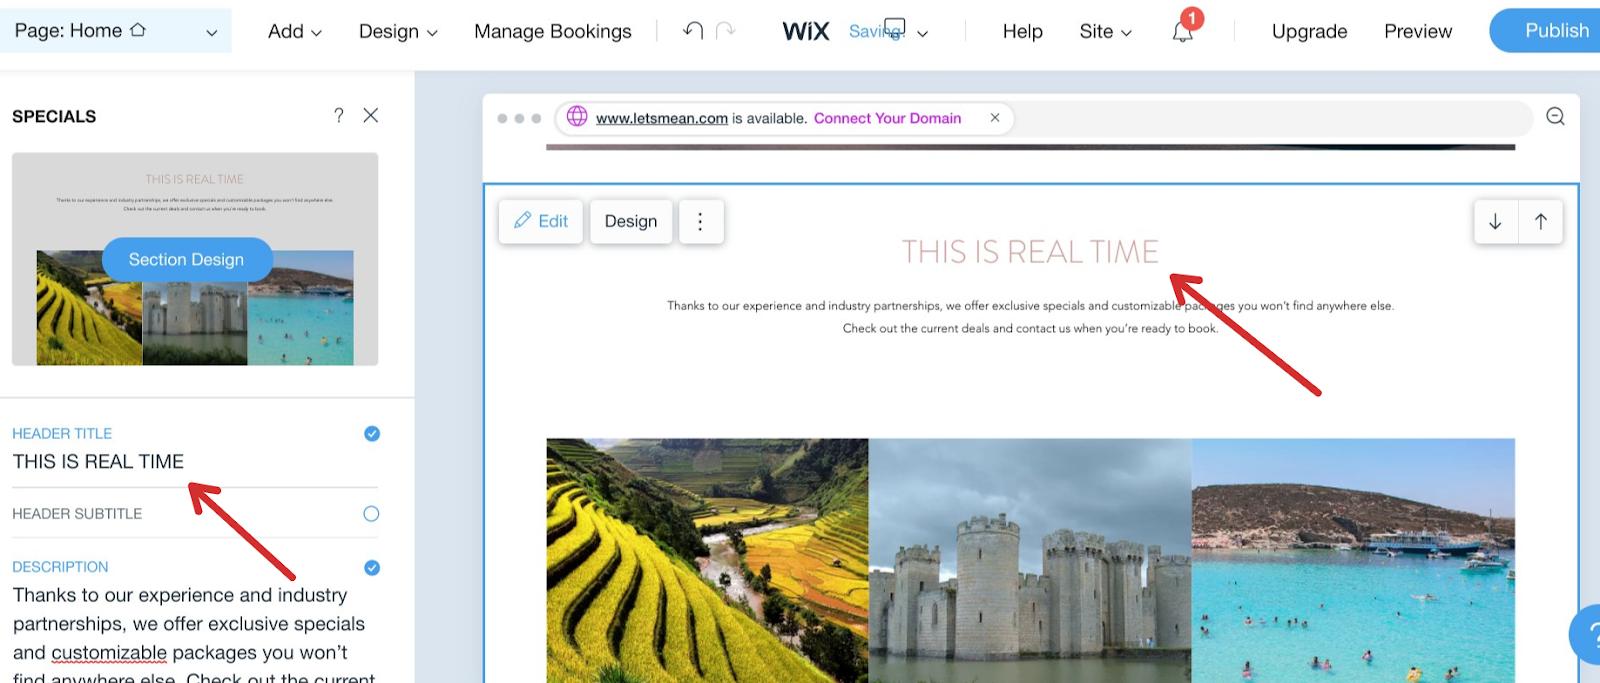 Adding Content in Wix